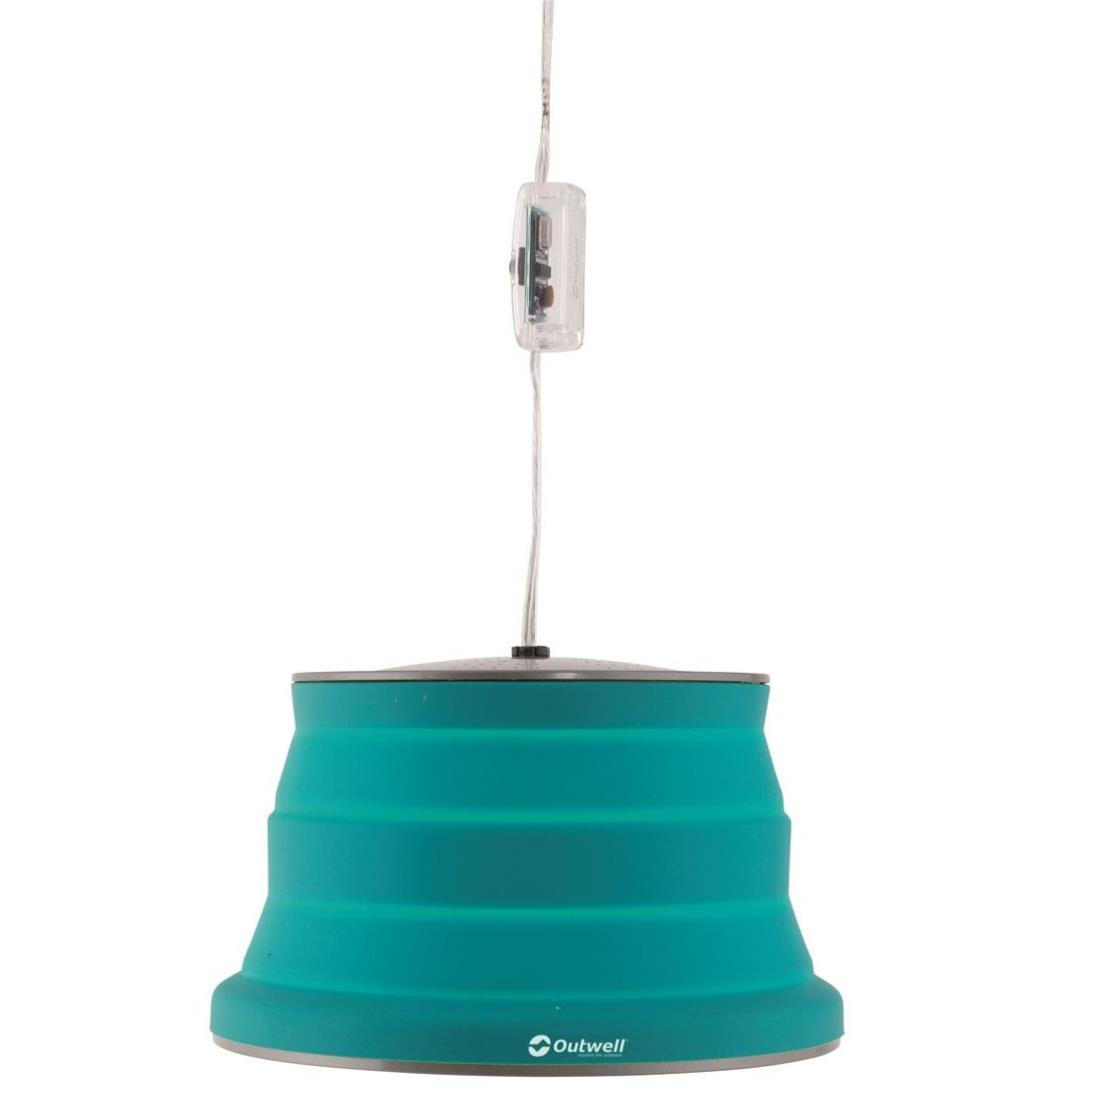 Outwell Orion inkl. Fernbedienung Campinglampe deep blue